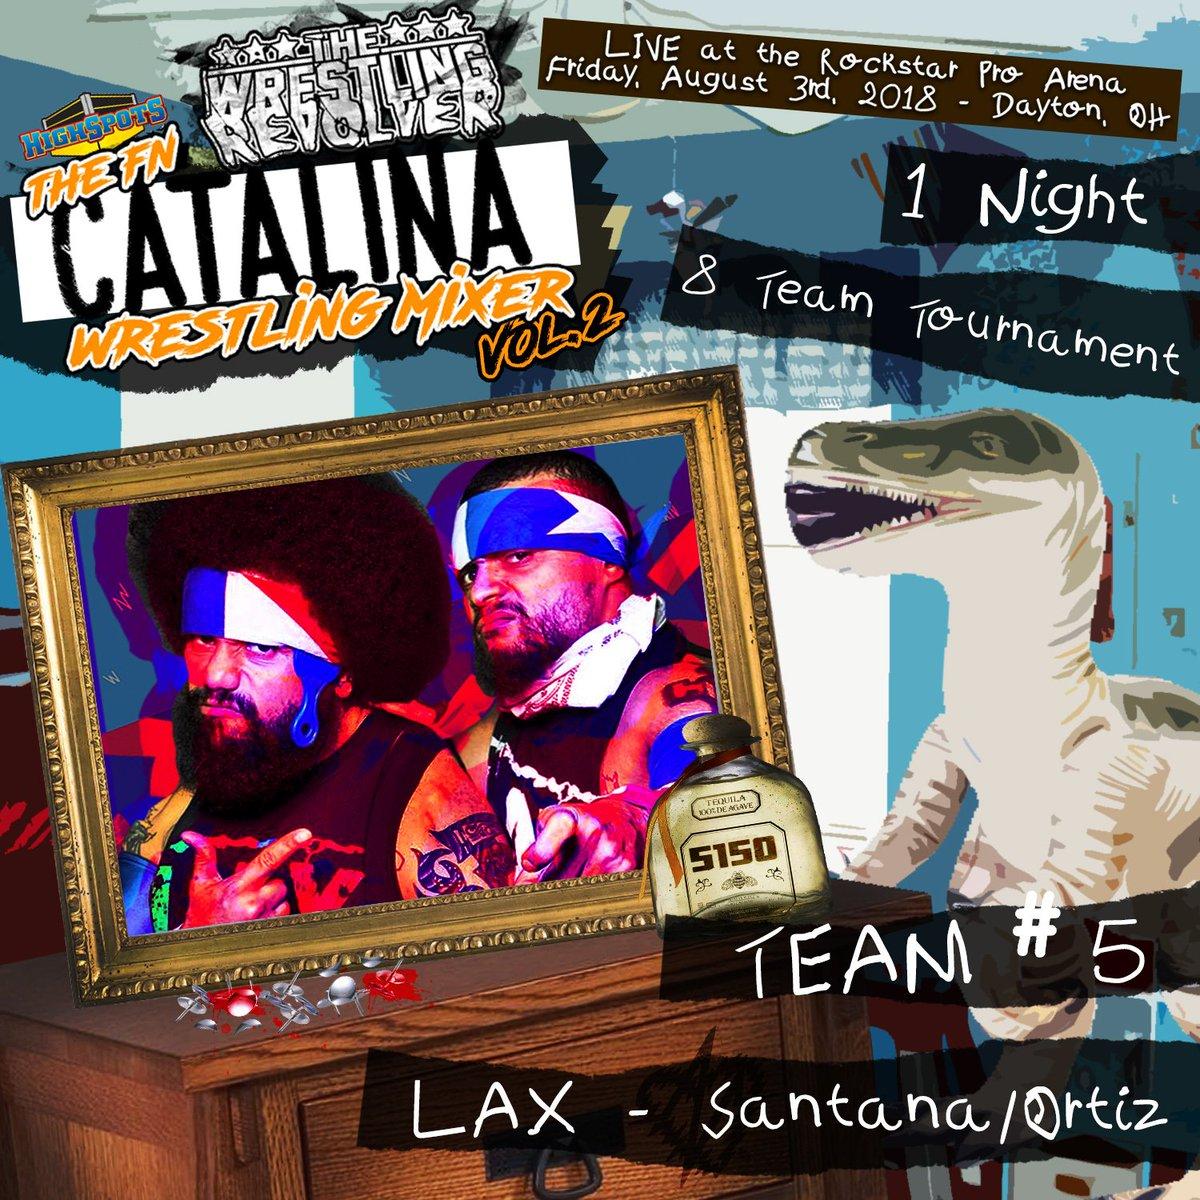 🔥🔥BREAKING/GET 50 RTs🔥🔥      (TEAM #5 signed for 8/3/18 #CatalinaWrestlingMixer Volume 2)       Former @IMPACTWRESTLING Tag Team Champions - LAX Santana & Ortiz!  TICKETS GO ON SALE TONIGHT - 5/21 at 8PM(est) ProWrestlingRevolver.com